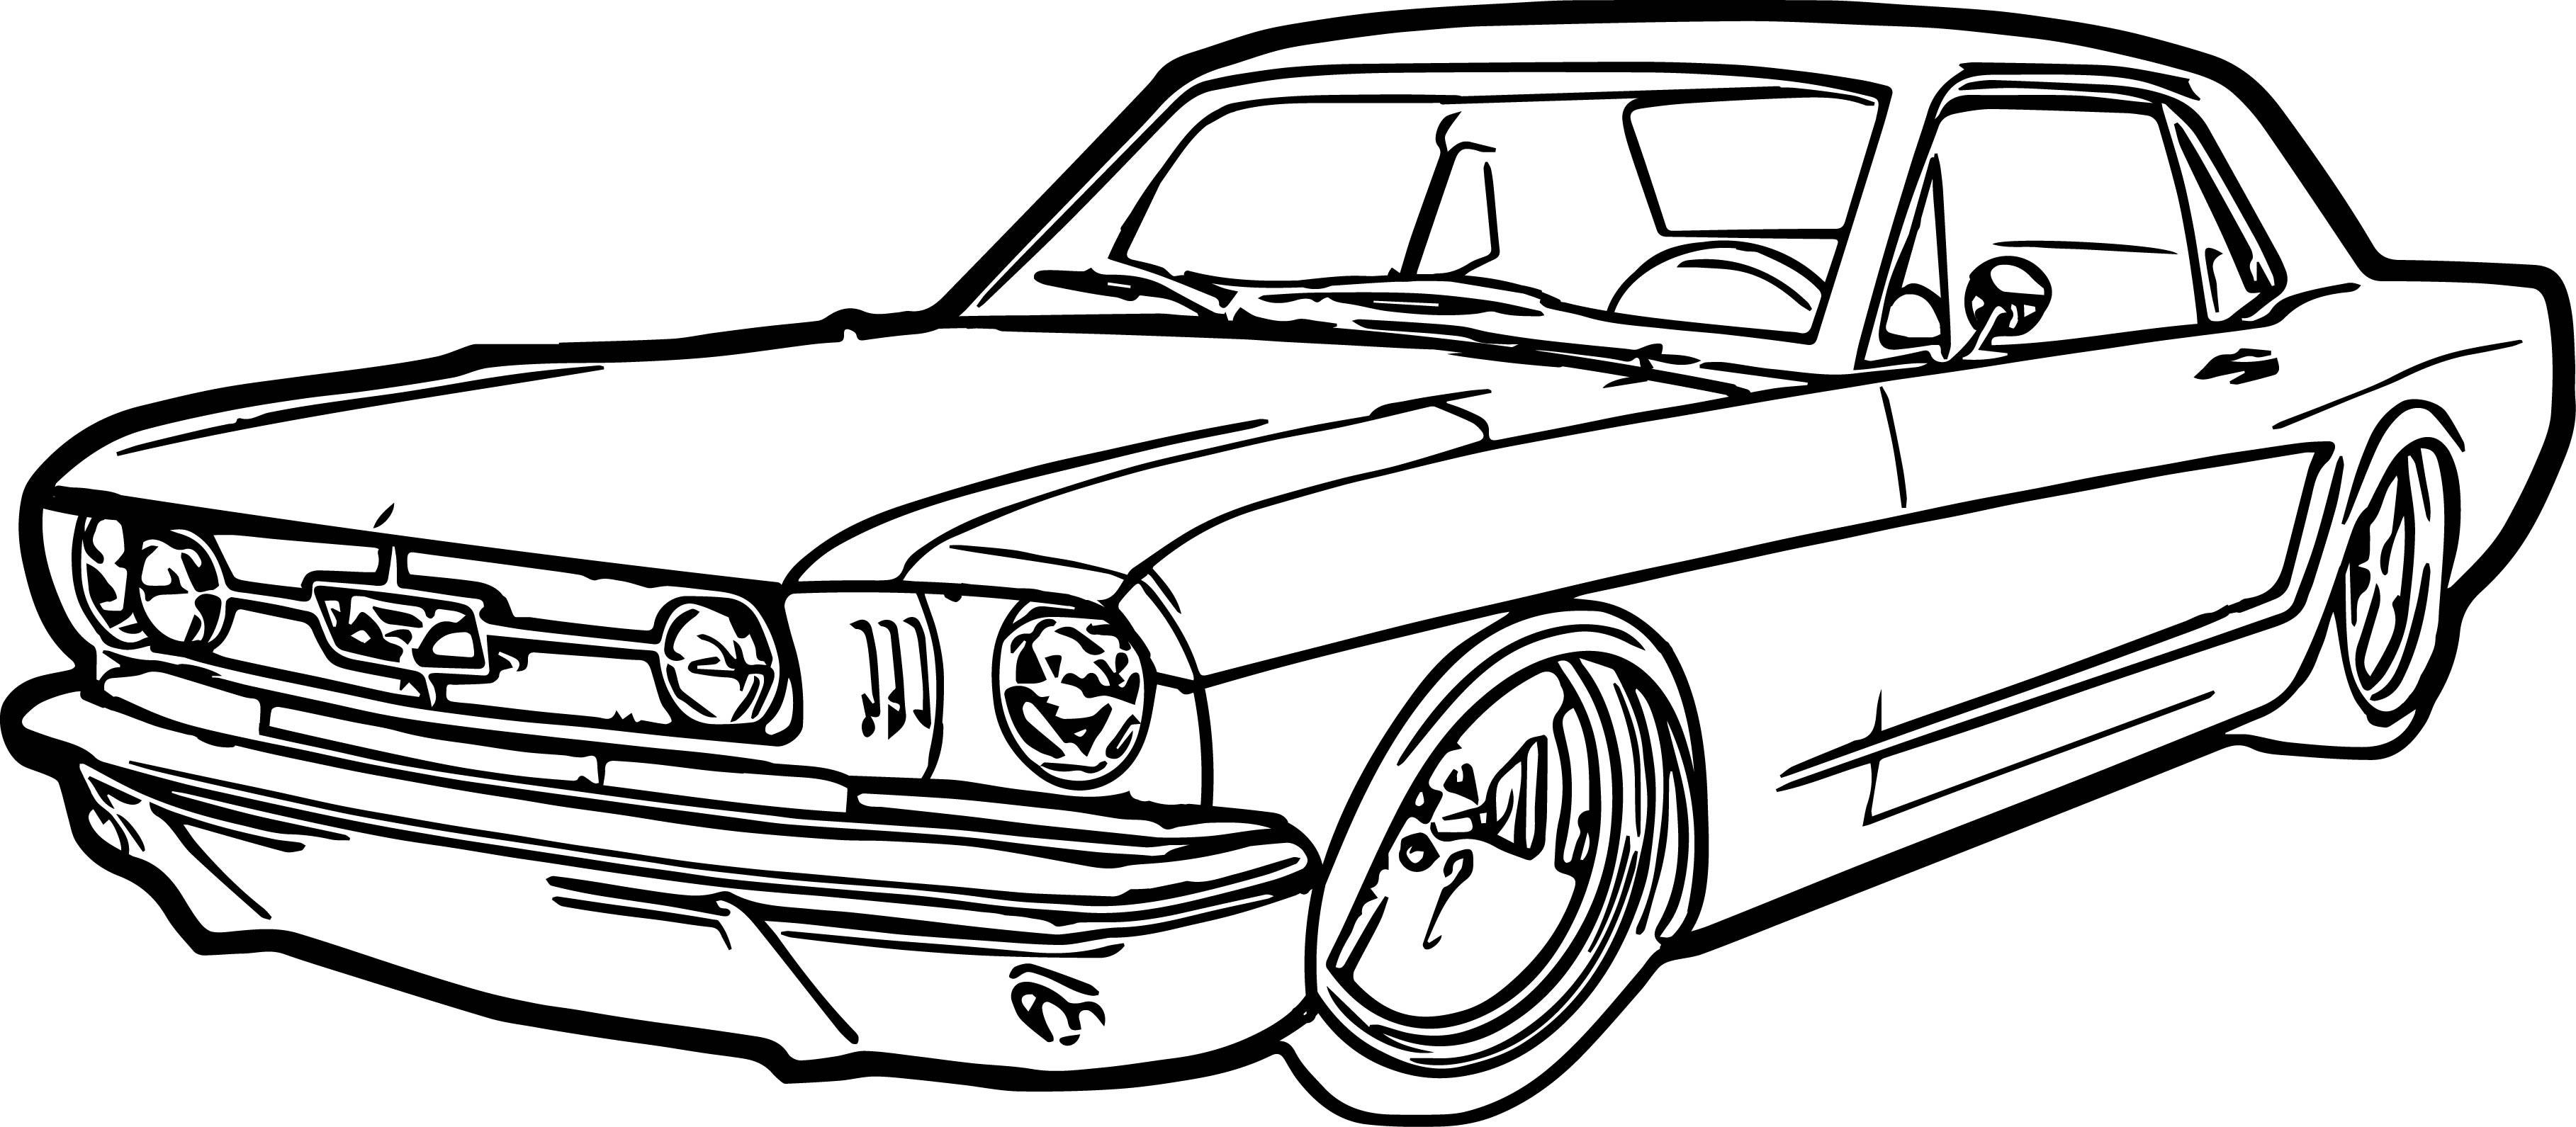 new car drawing at getdrawings com